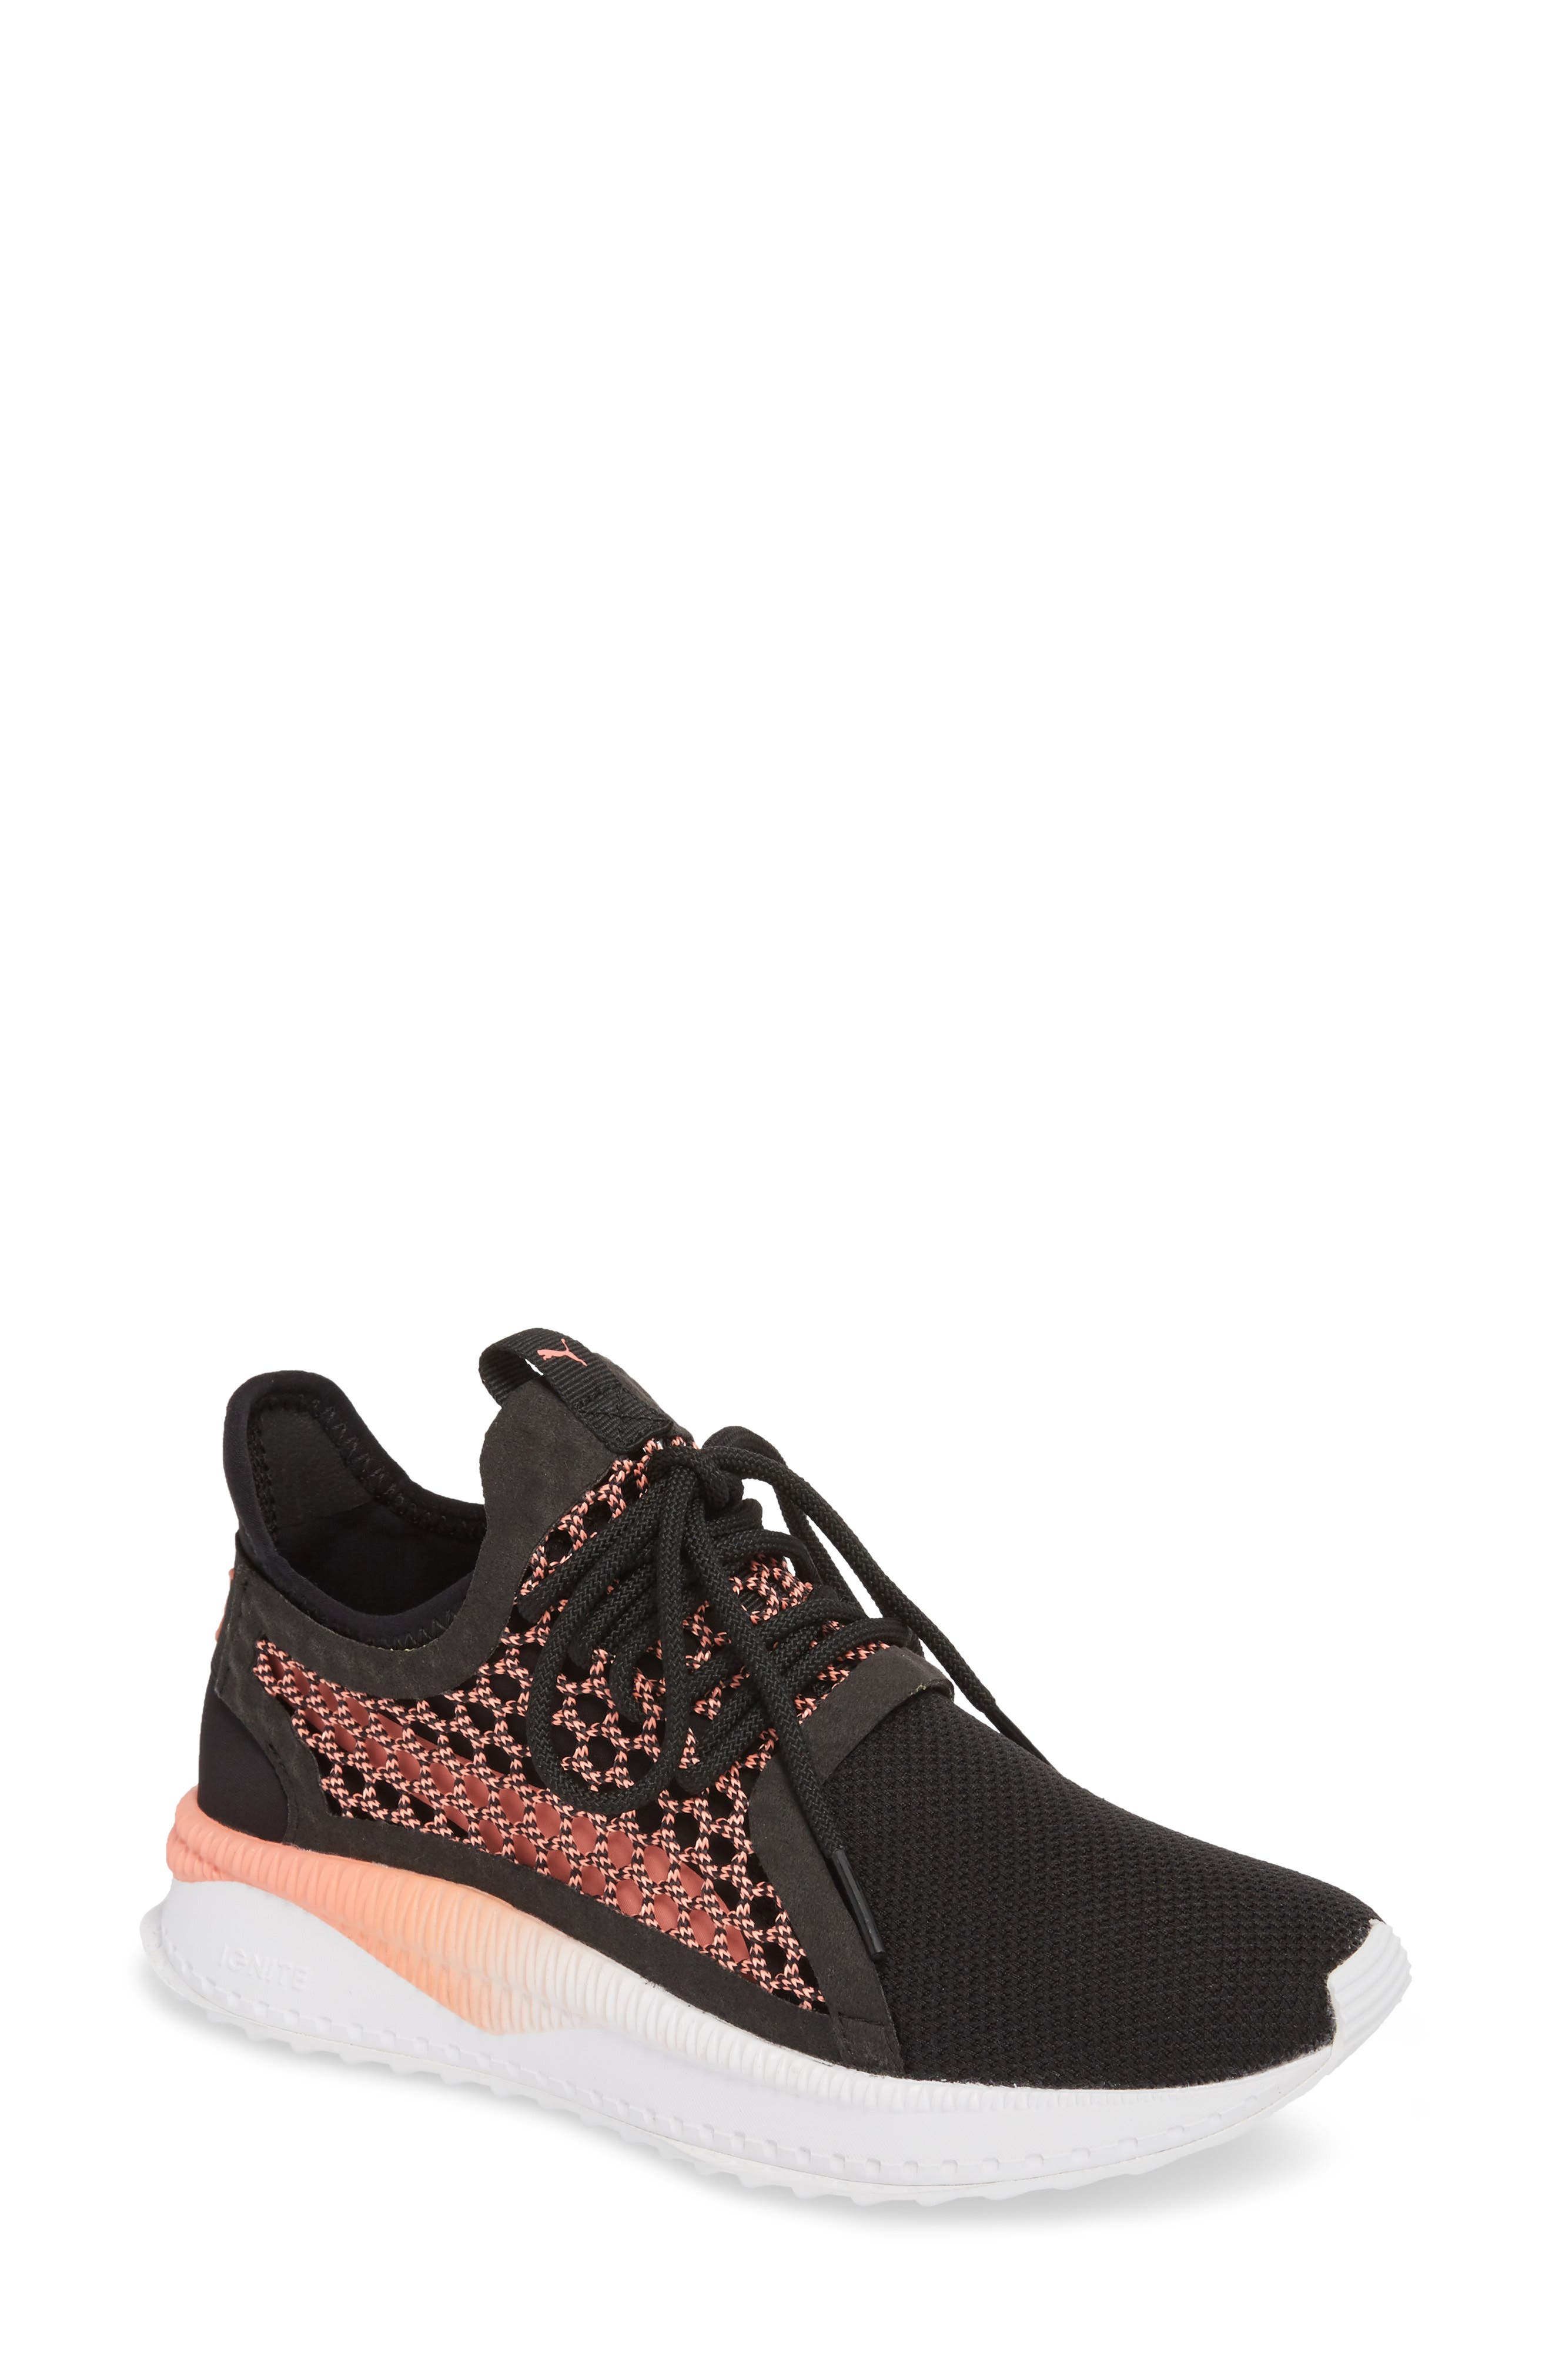 Puma Tsugi Netfit evoKNIT Training Shoe (Women)